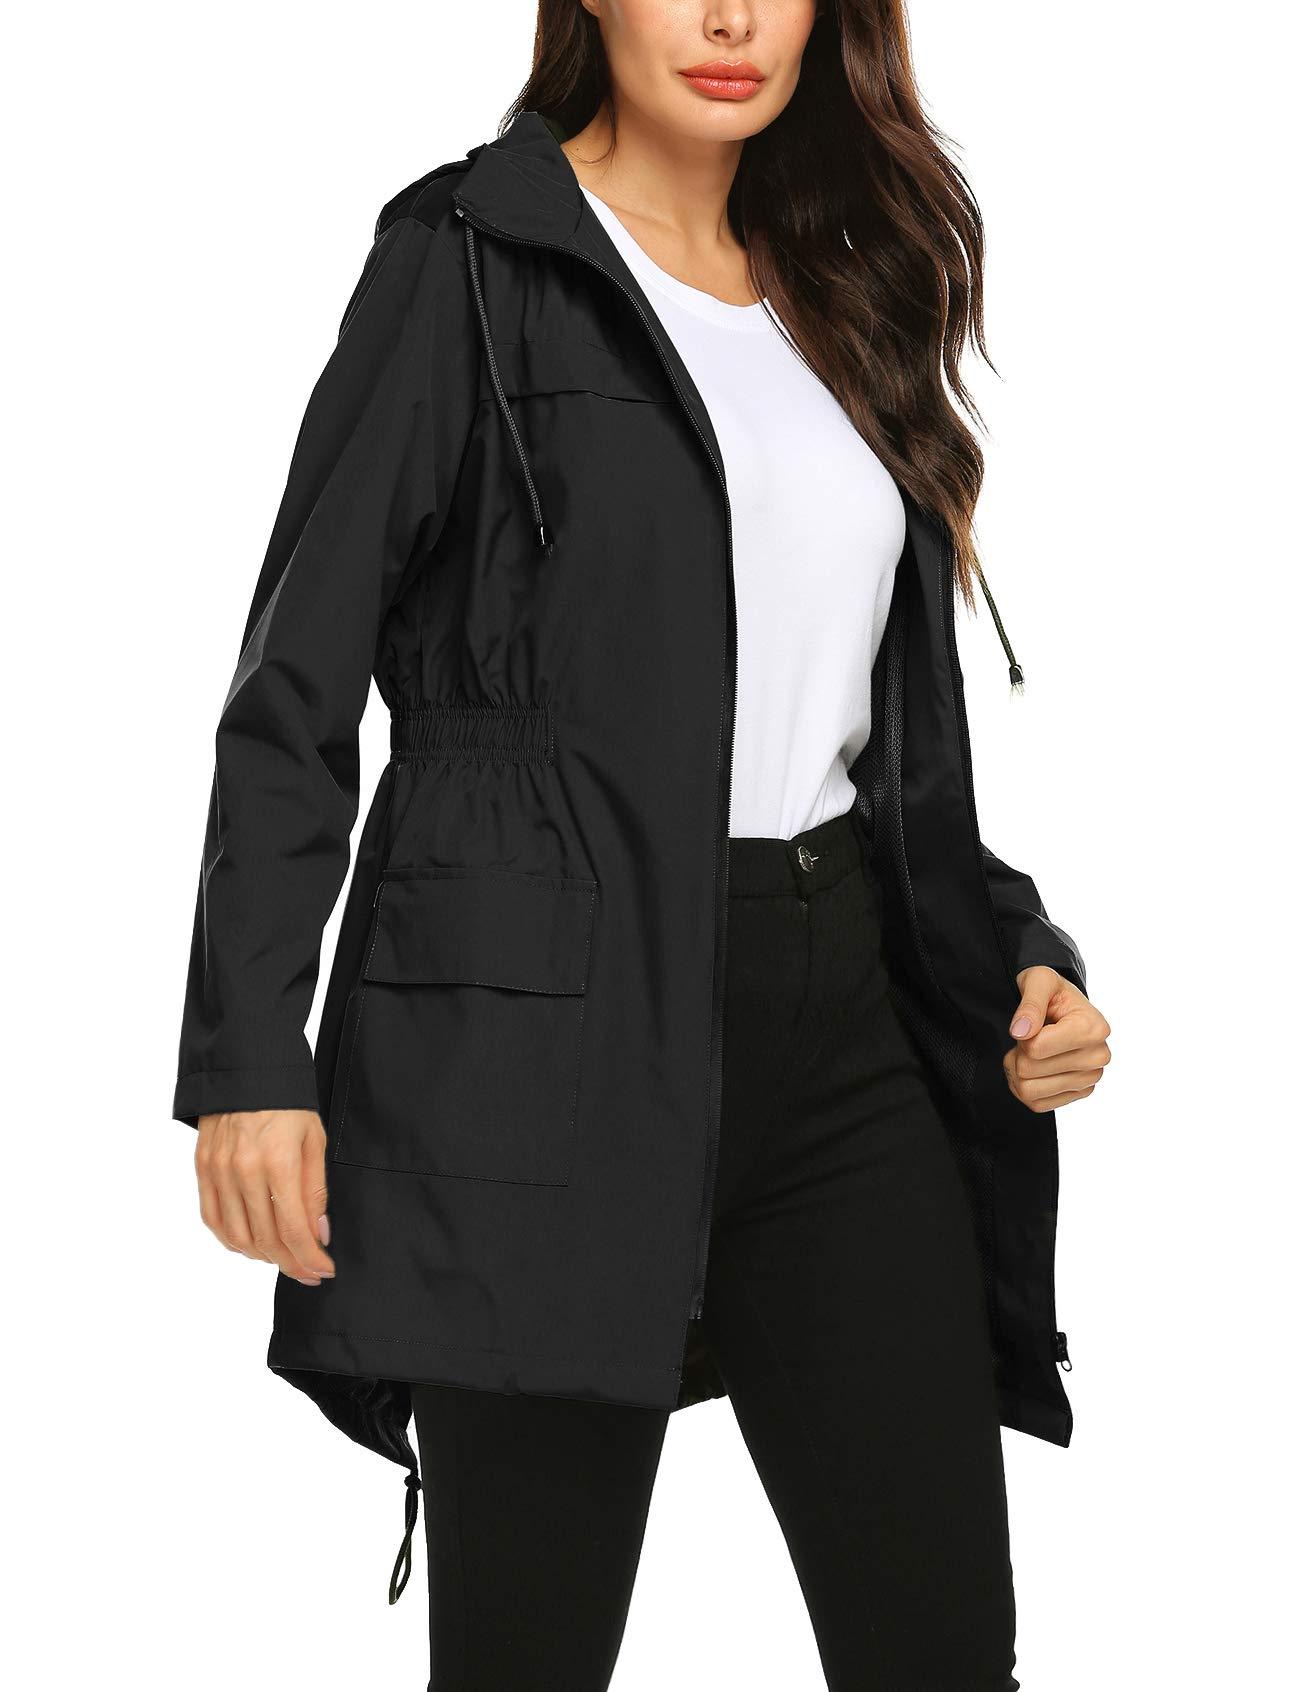 Avoogue Active Outdoor Hooded Lightweight Windbreaker Long Jacket Womens Raincoat Lining Plus Size Black M by Avoogue